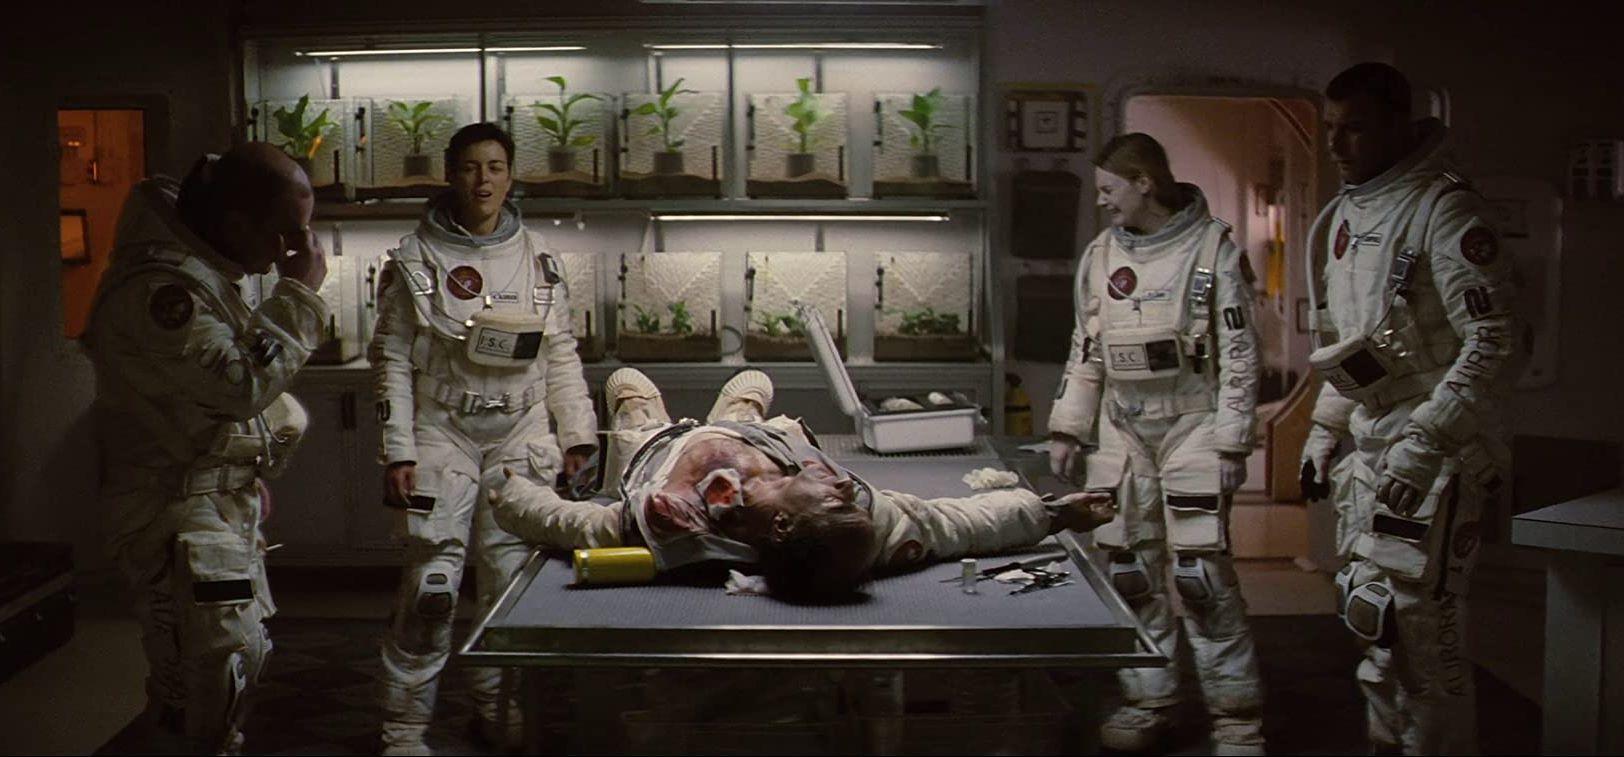 The crew of the Aurora 2 - Johnny Harris, Olivia Williams, Elias Koteas, Romola Garai and Liev Schreiber in The Last Days on Mars (2013)